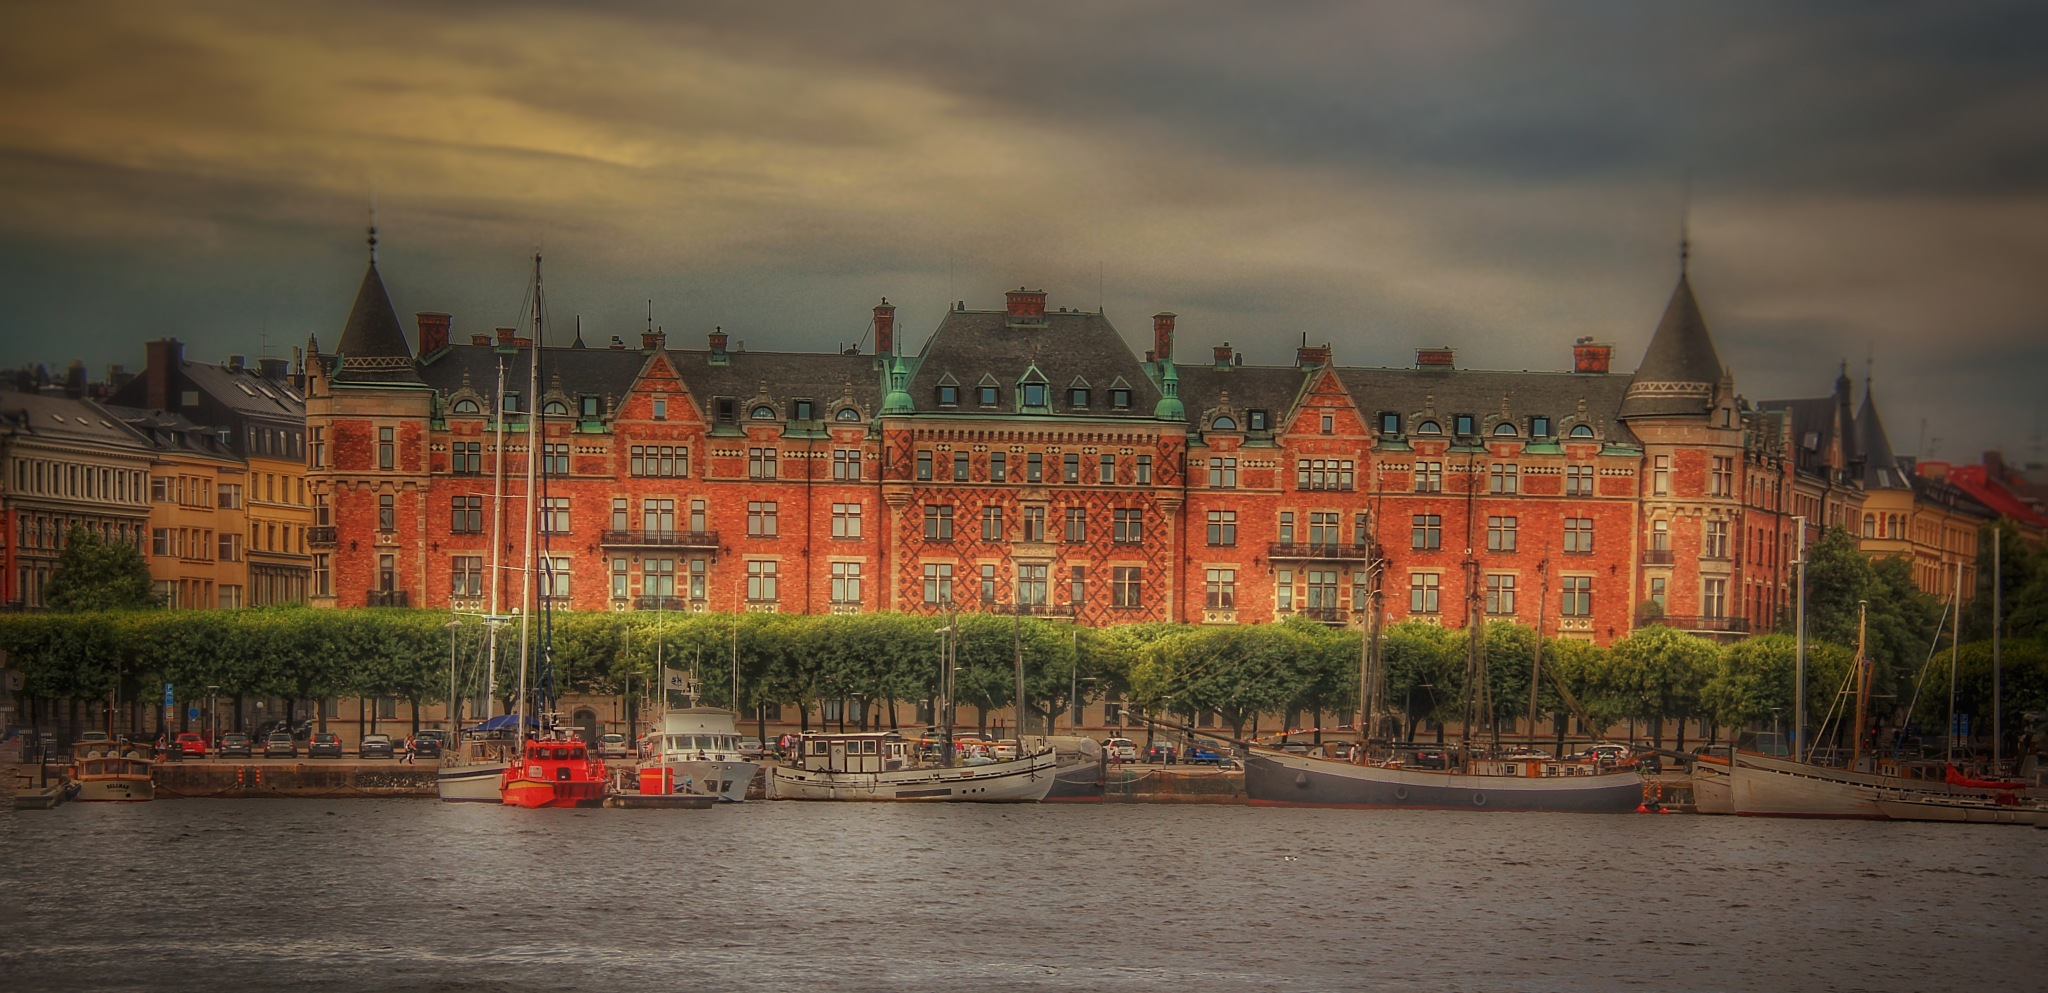 Stockholm by Annica Josefsson